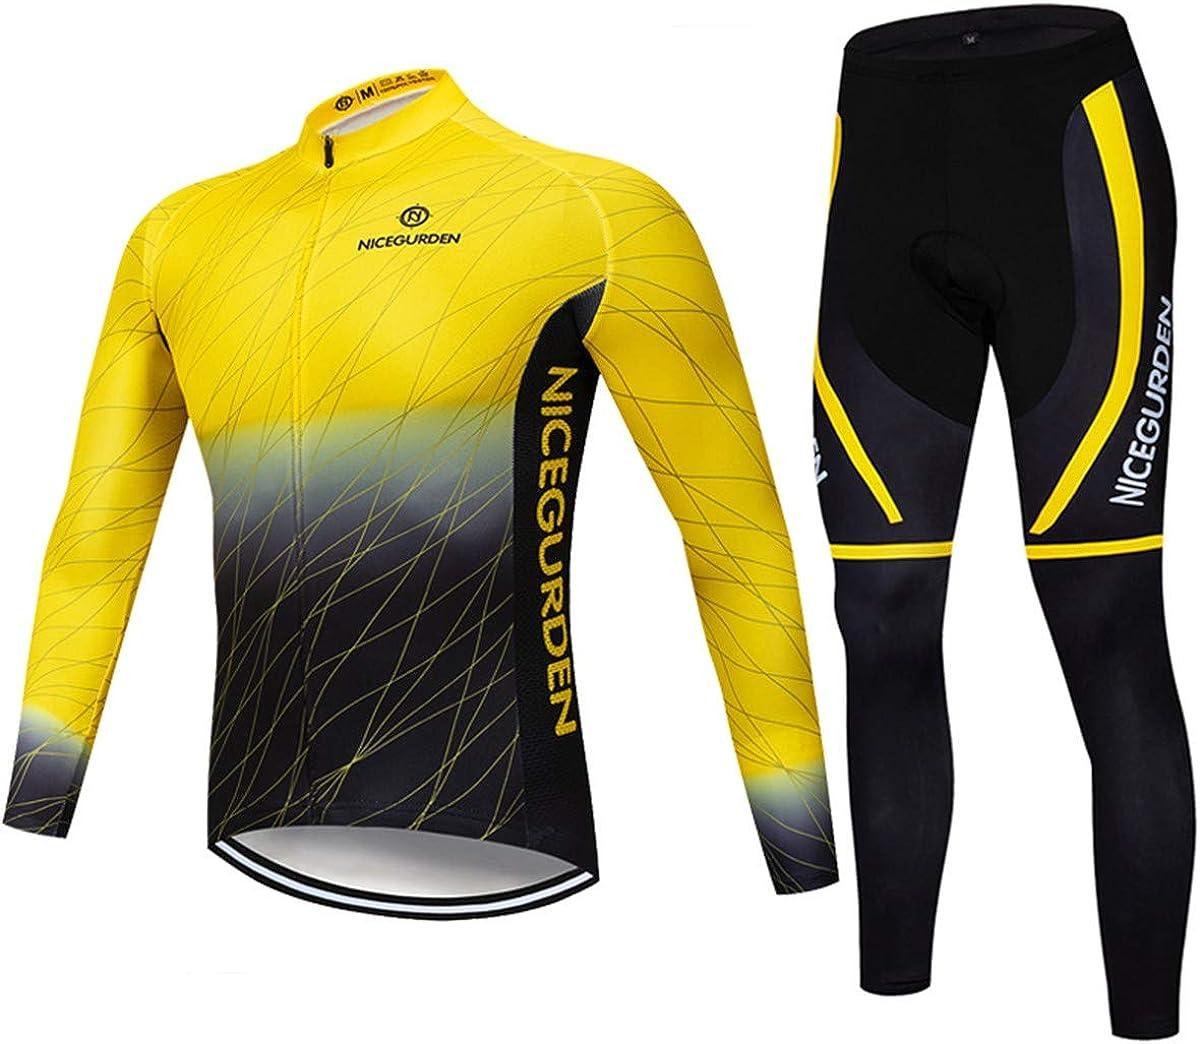 NICEGURDEN Mens Long Sleeve Cycling Jerse Clothing Bike Milwaukee Mall Popular Mountain